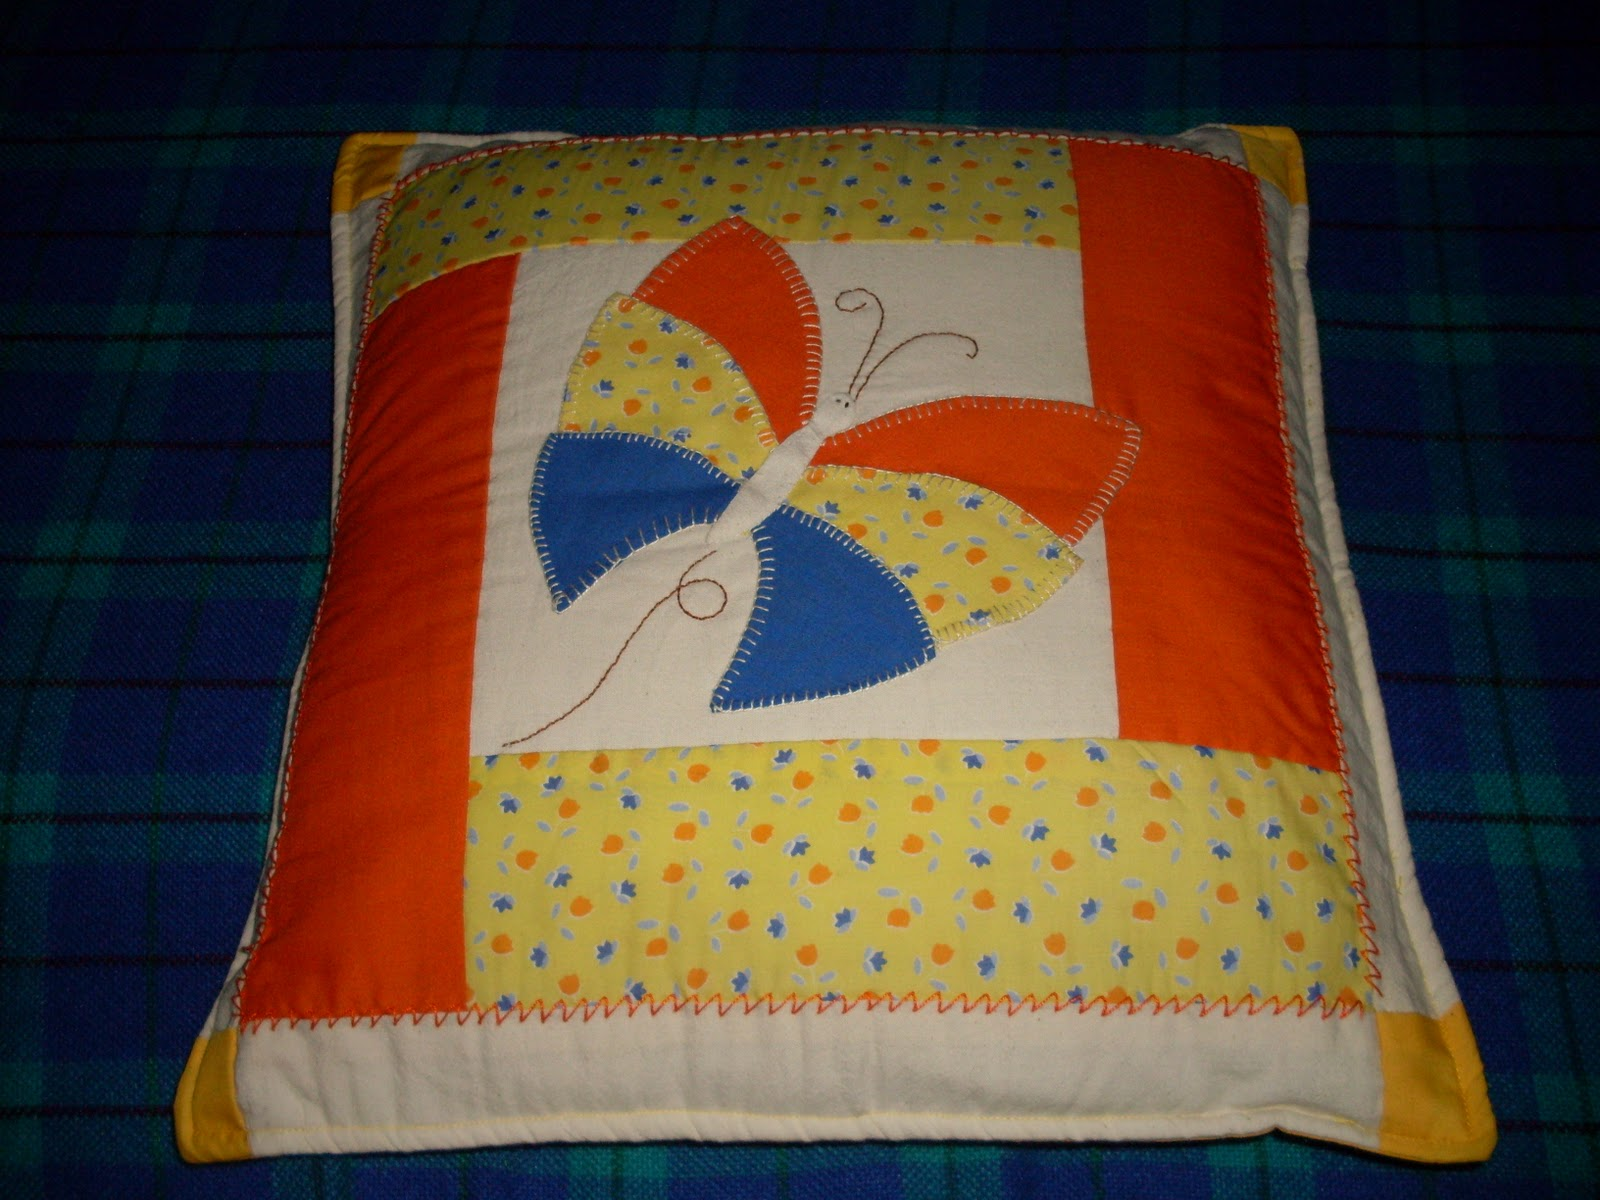 Taller creativo manualidades san jose cojines en patchwork - Cojines de patchwork ...